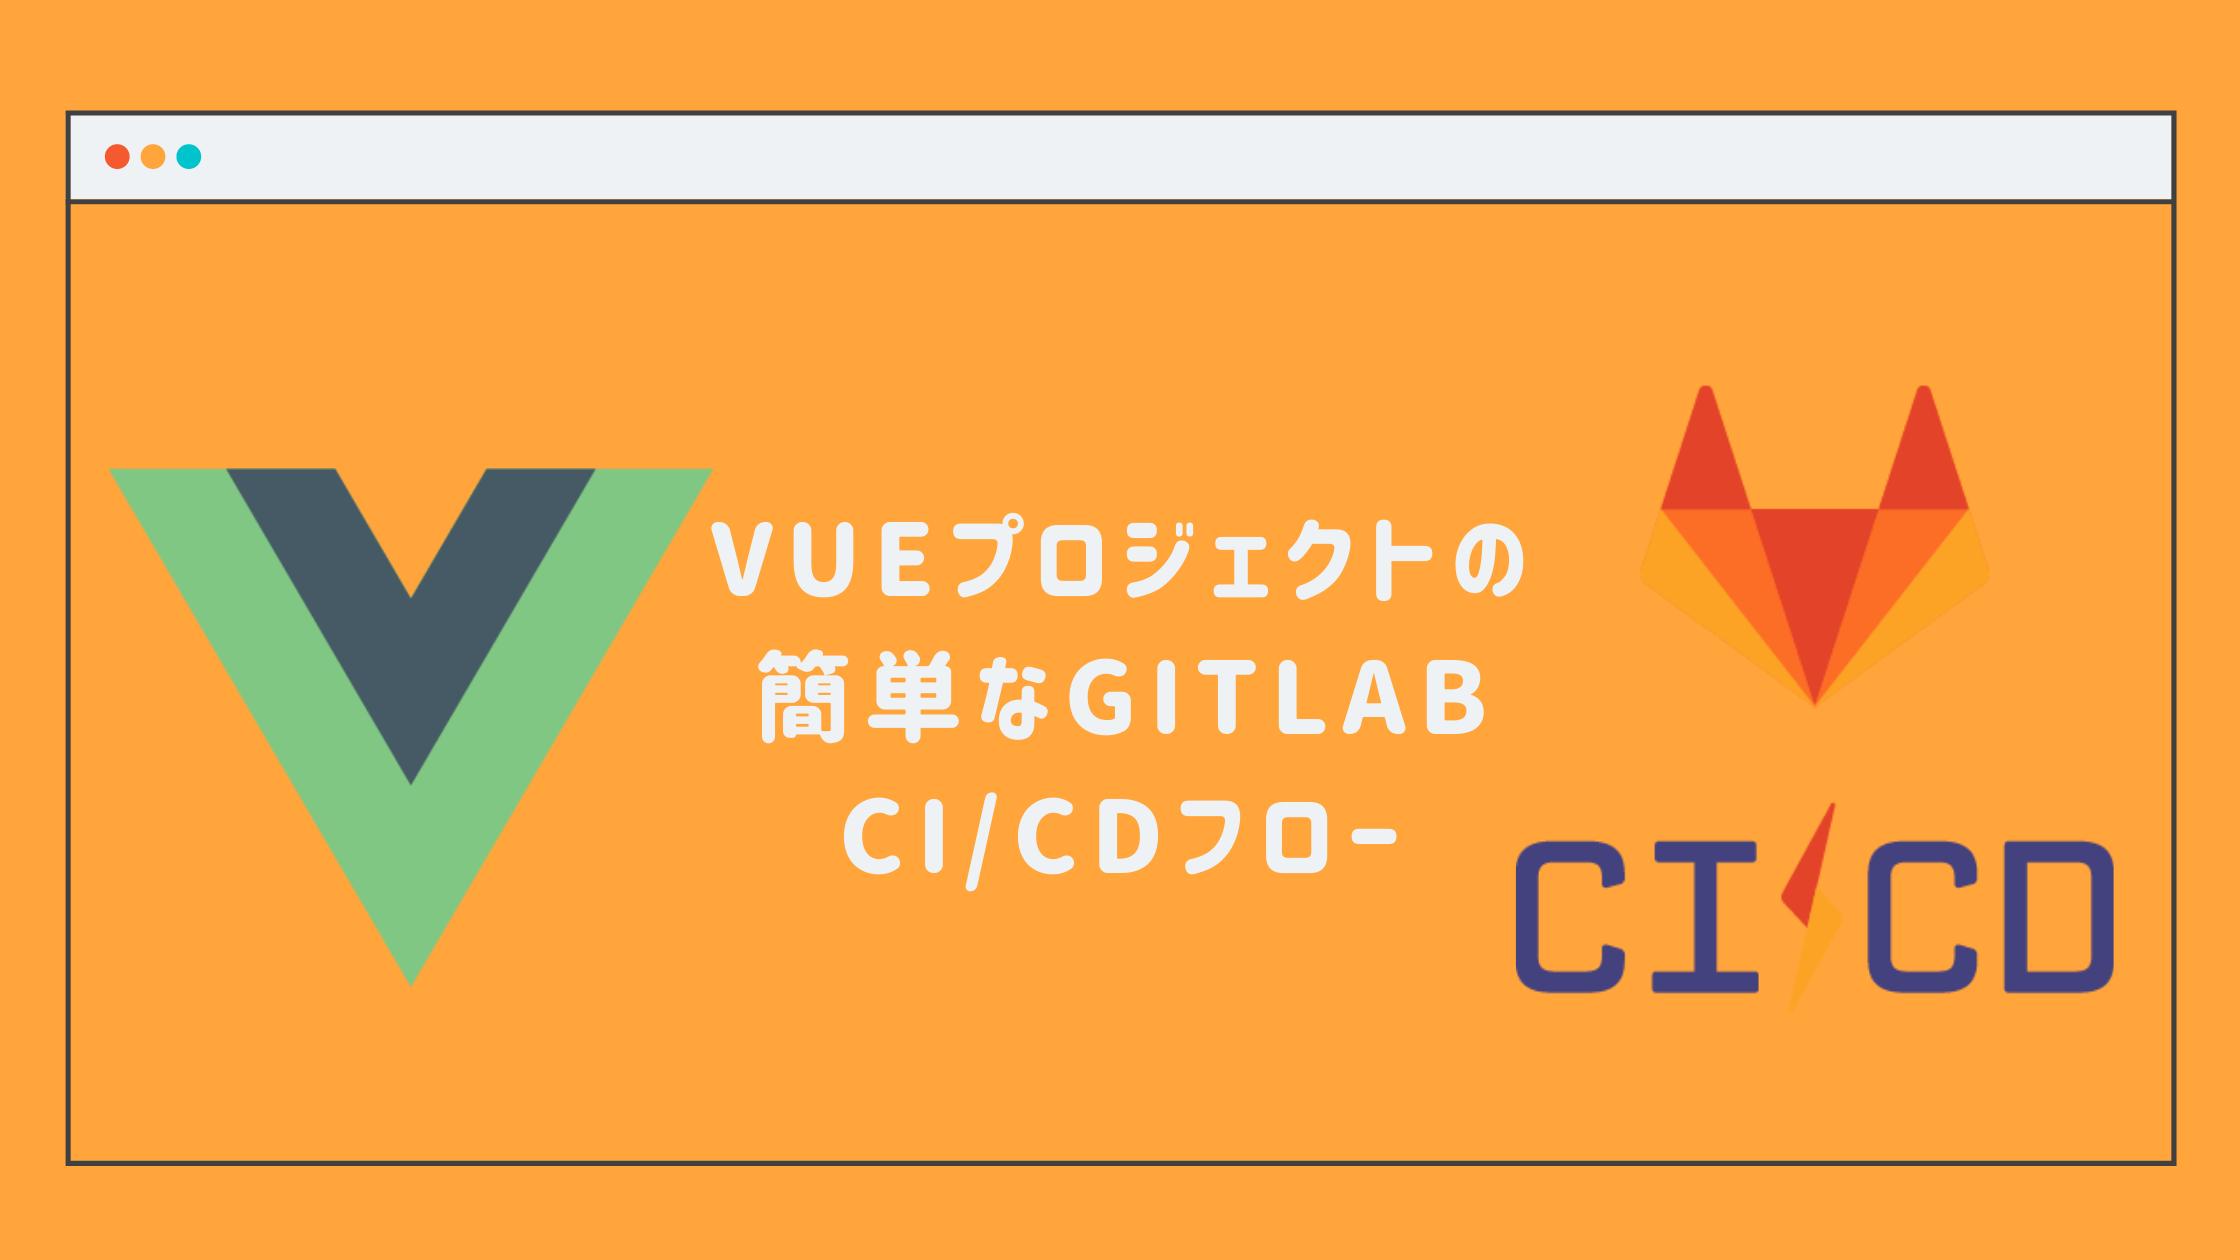 Vueプロジェクトの簡単なGitLab CI/CDフロー